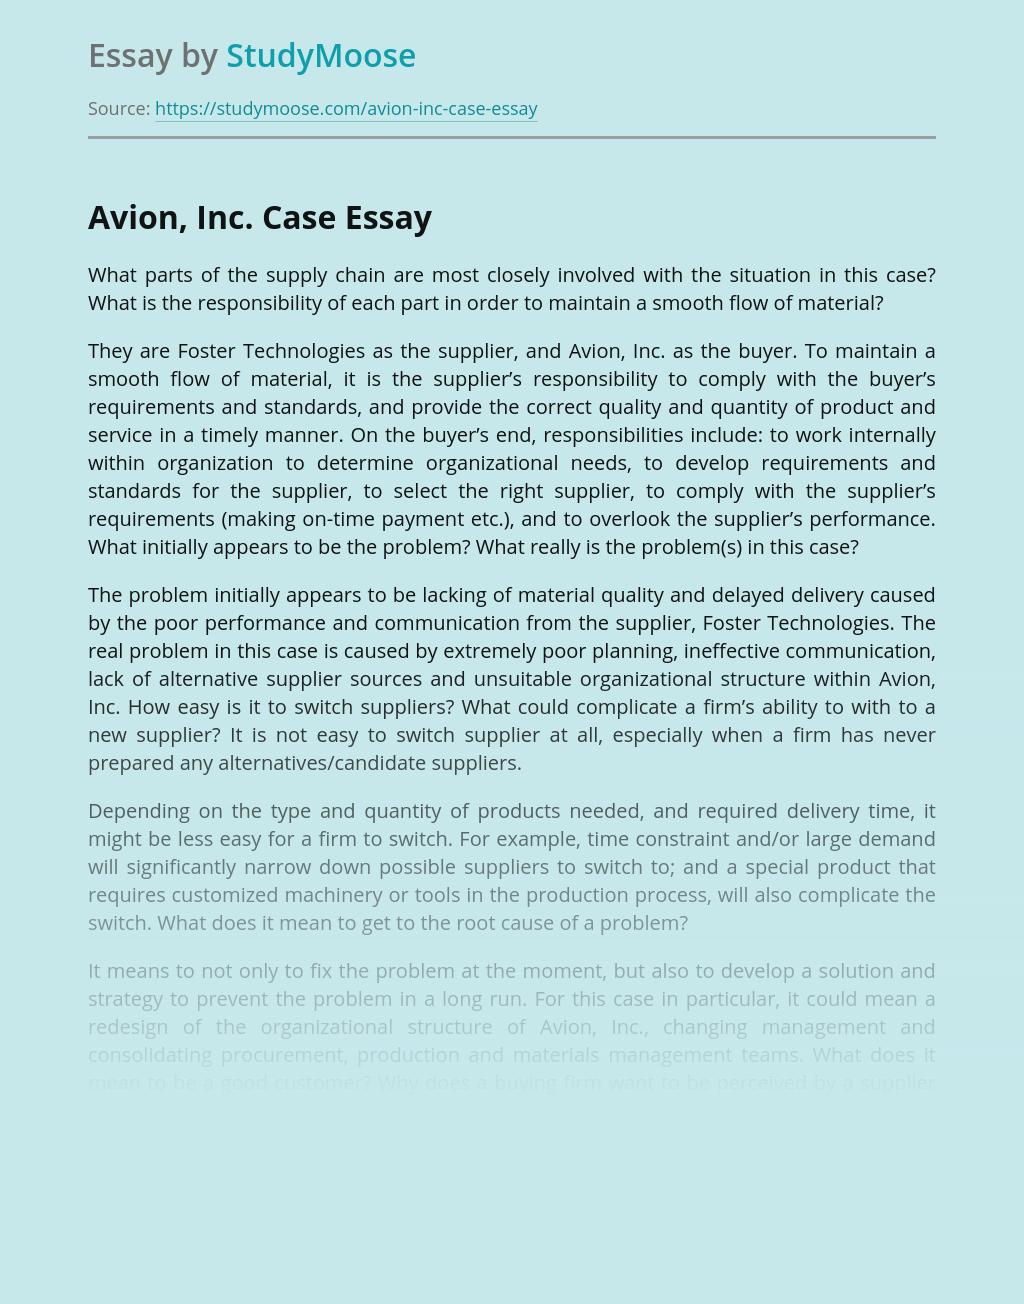 Avion, Inc. Case